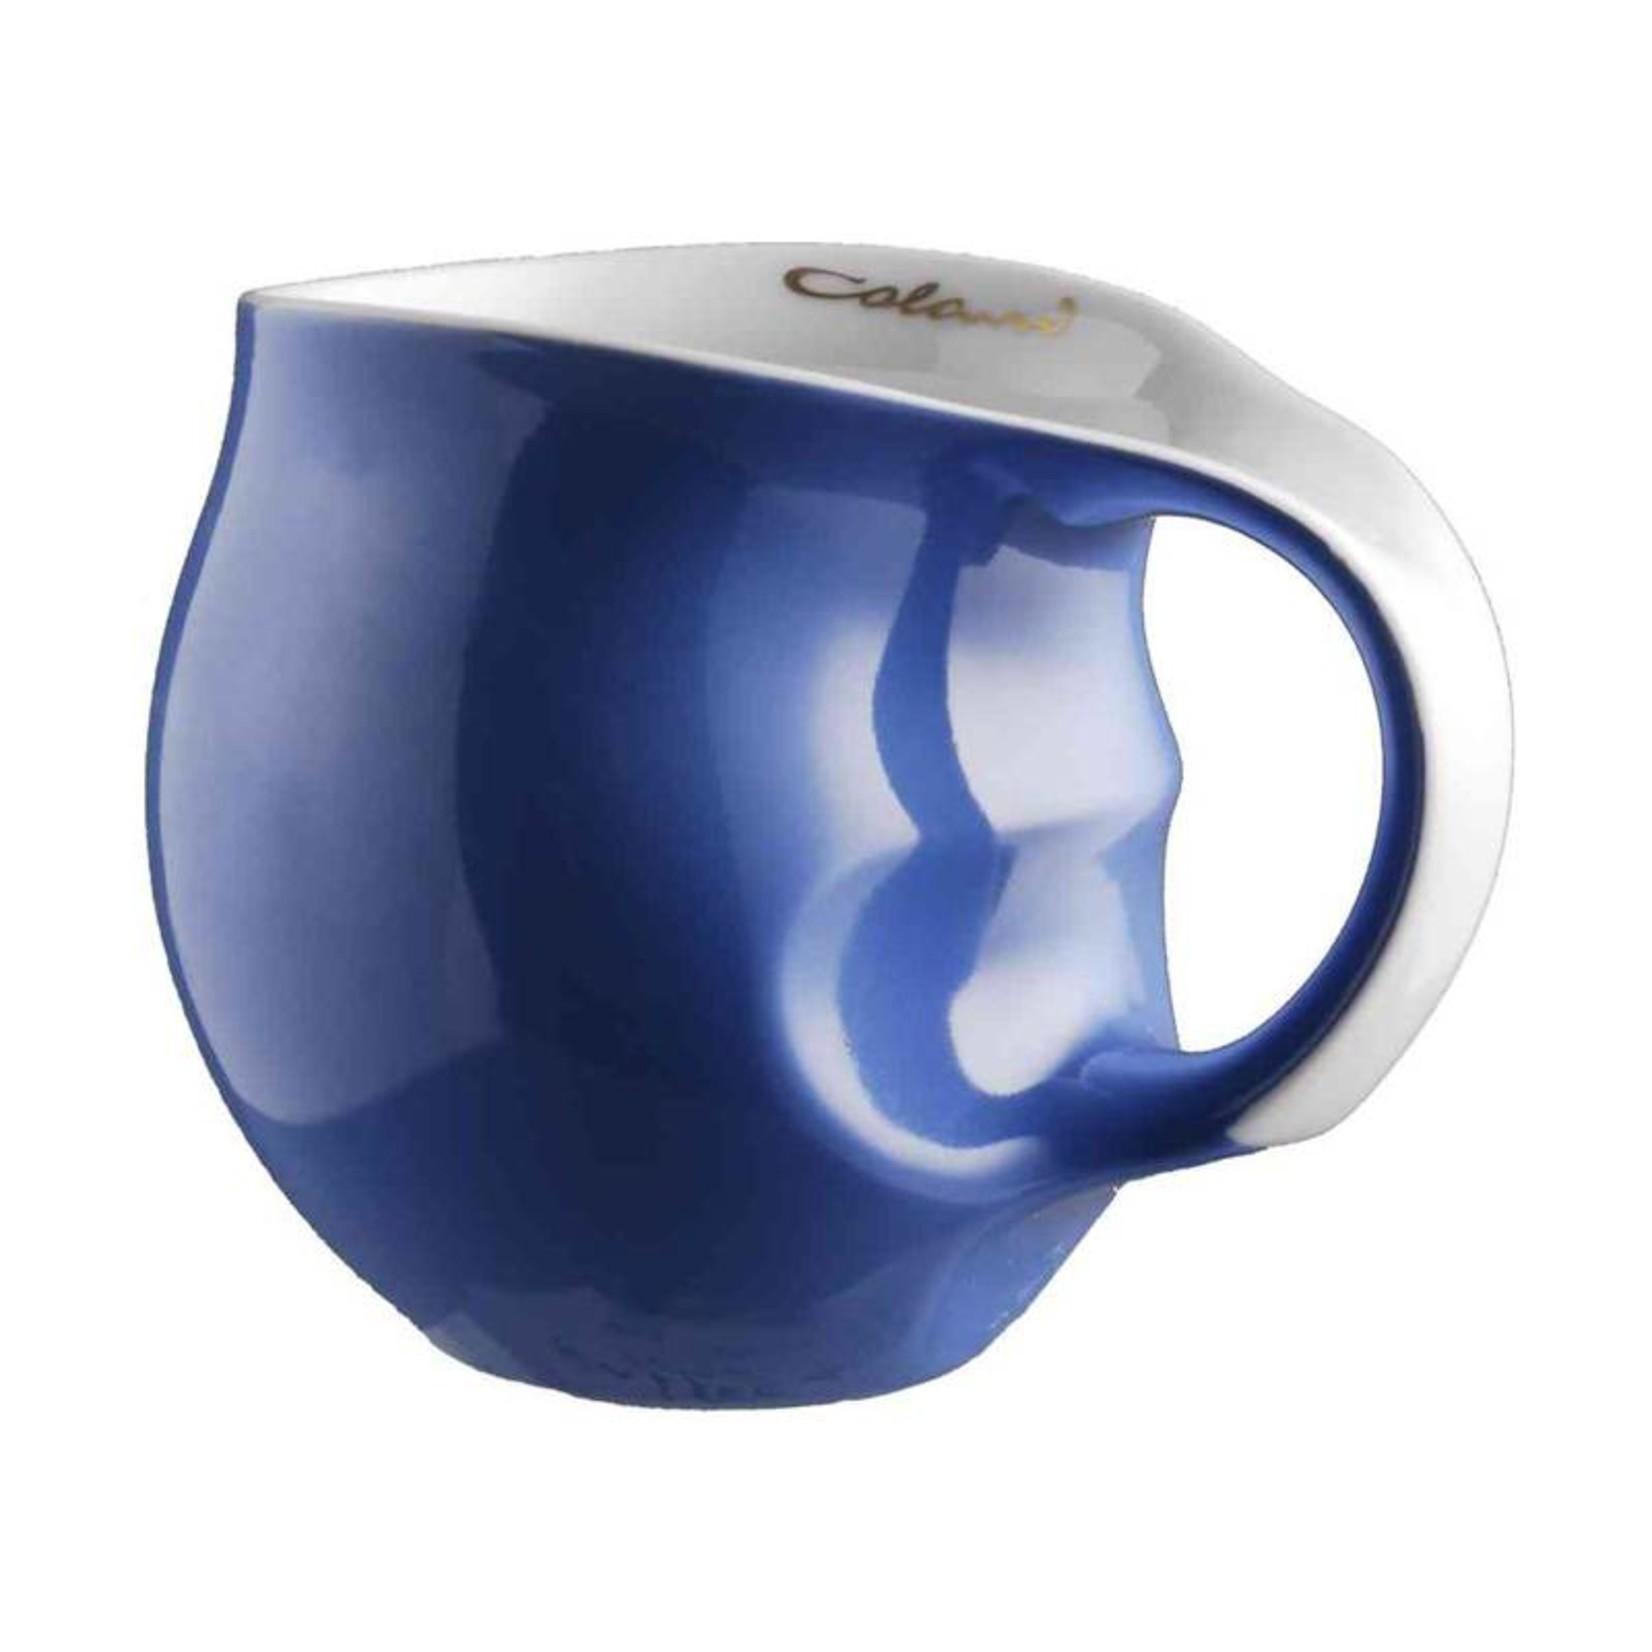 Colani Porzellanserie Luigi Colani Kaffeebecher aus Porzellan in Blau